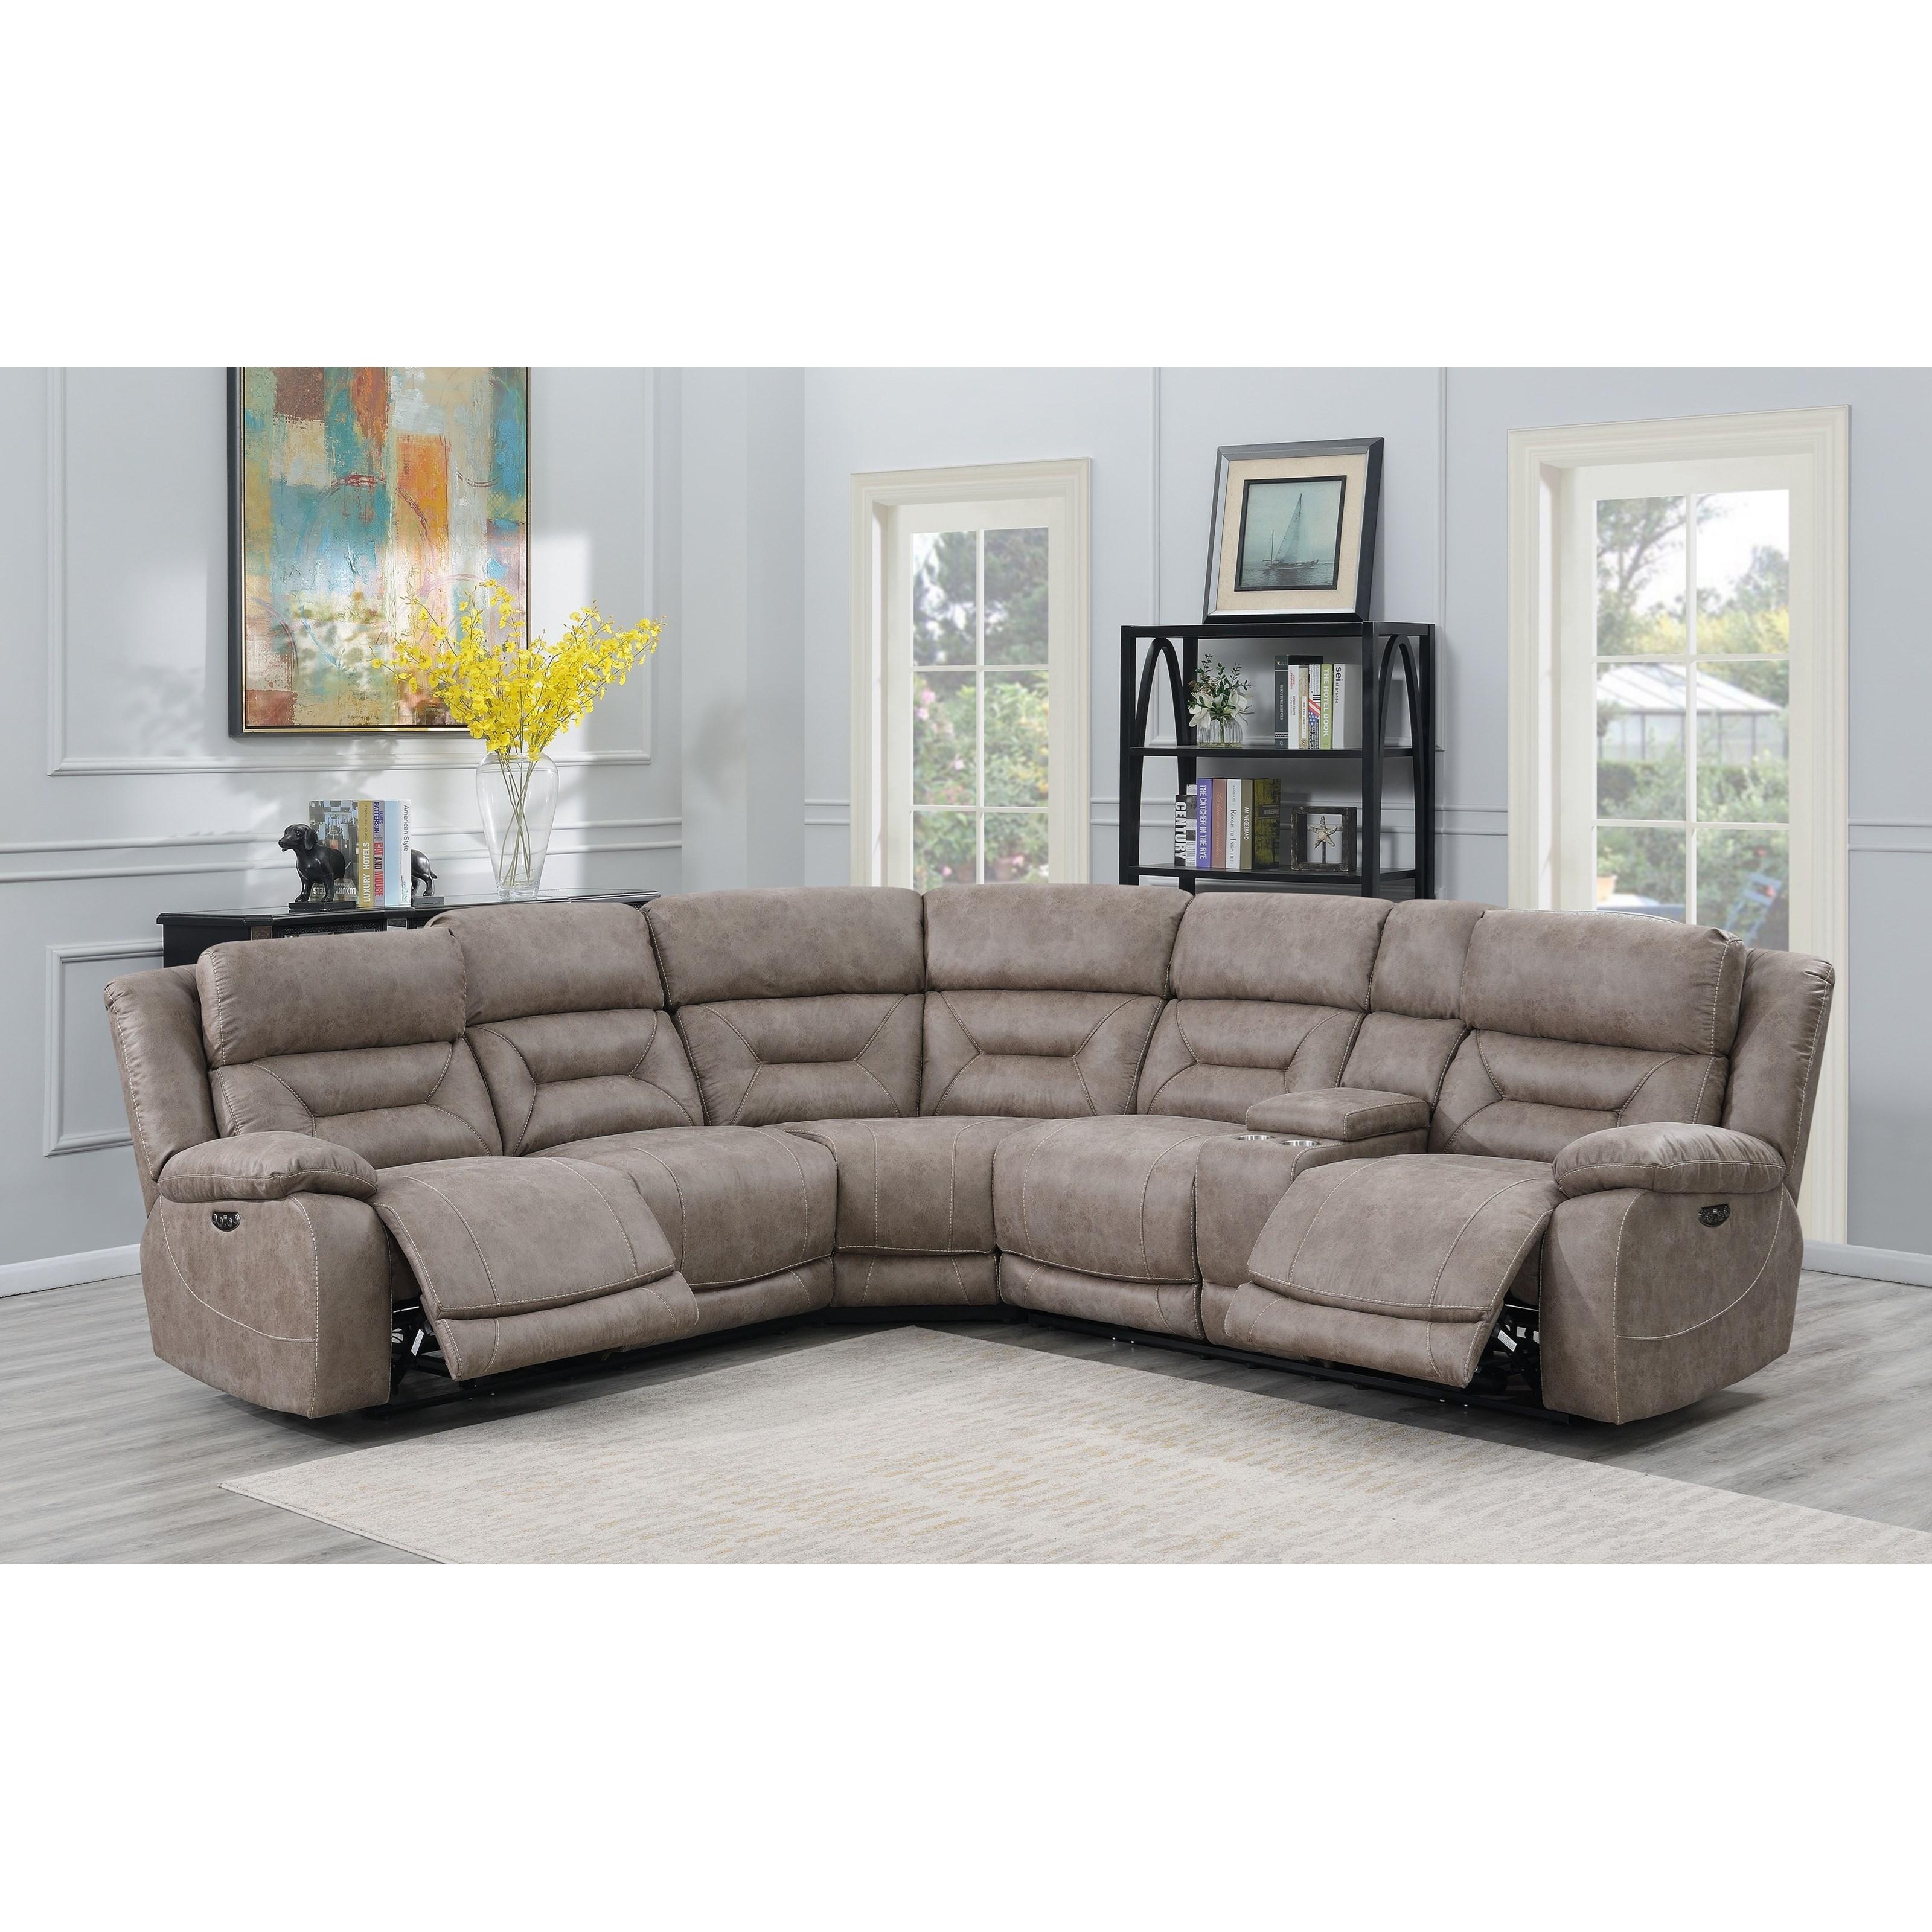 Vendor 3985 Aria 3 Piece Reclining Sectional Sofa With Usb